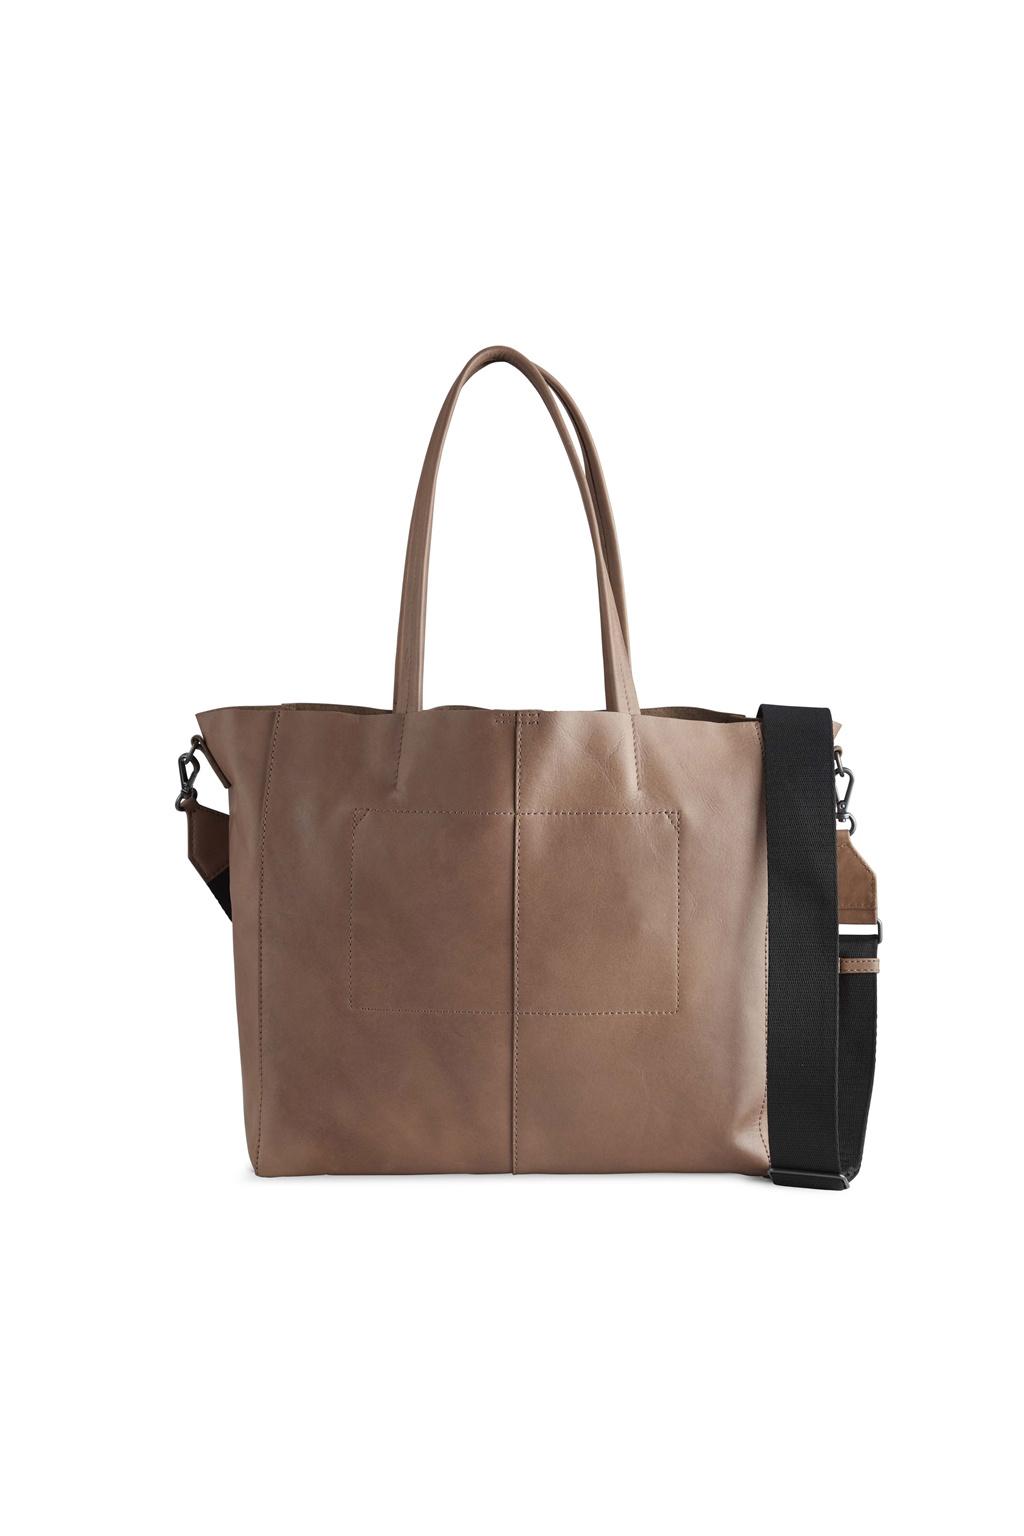 Reese Shopper Bag - Antique Caramel w/ Black-5